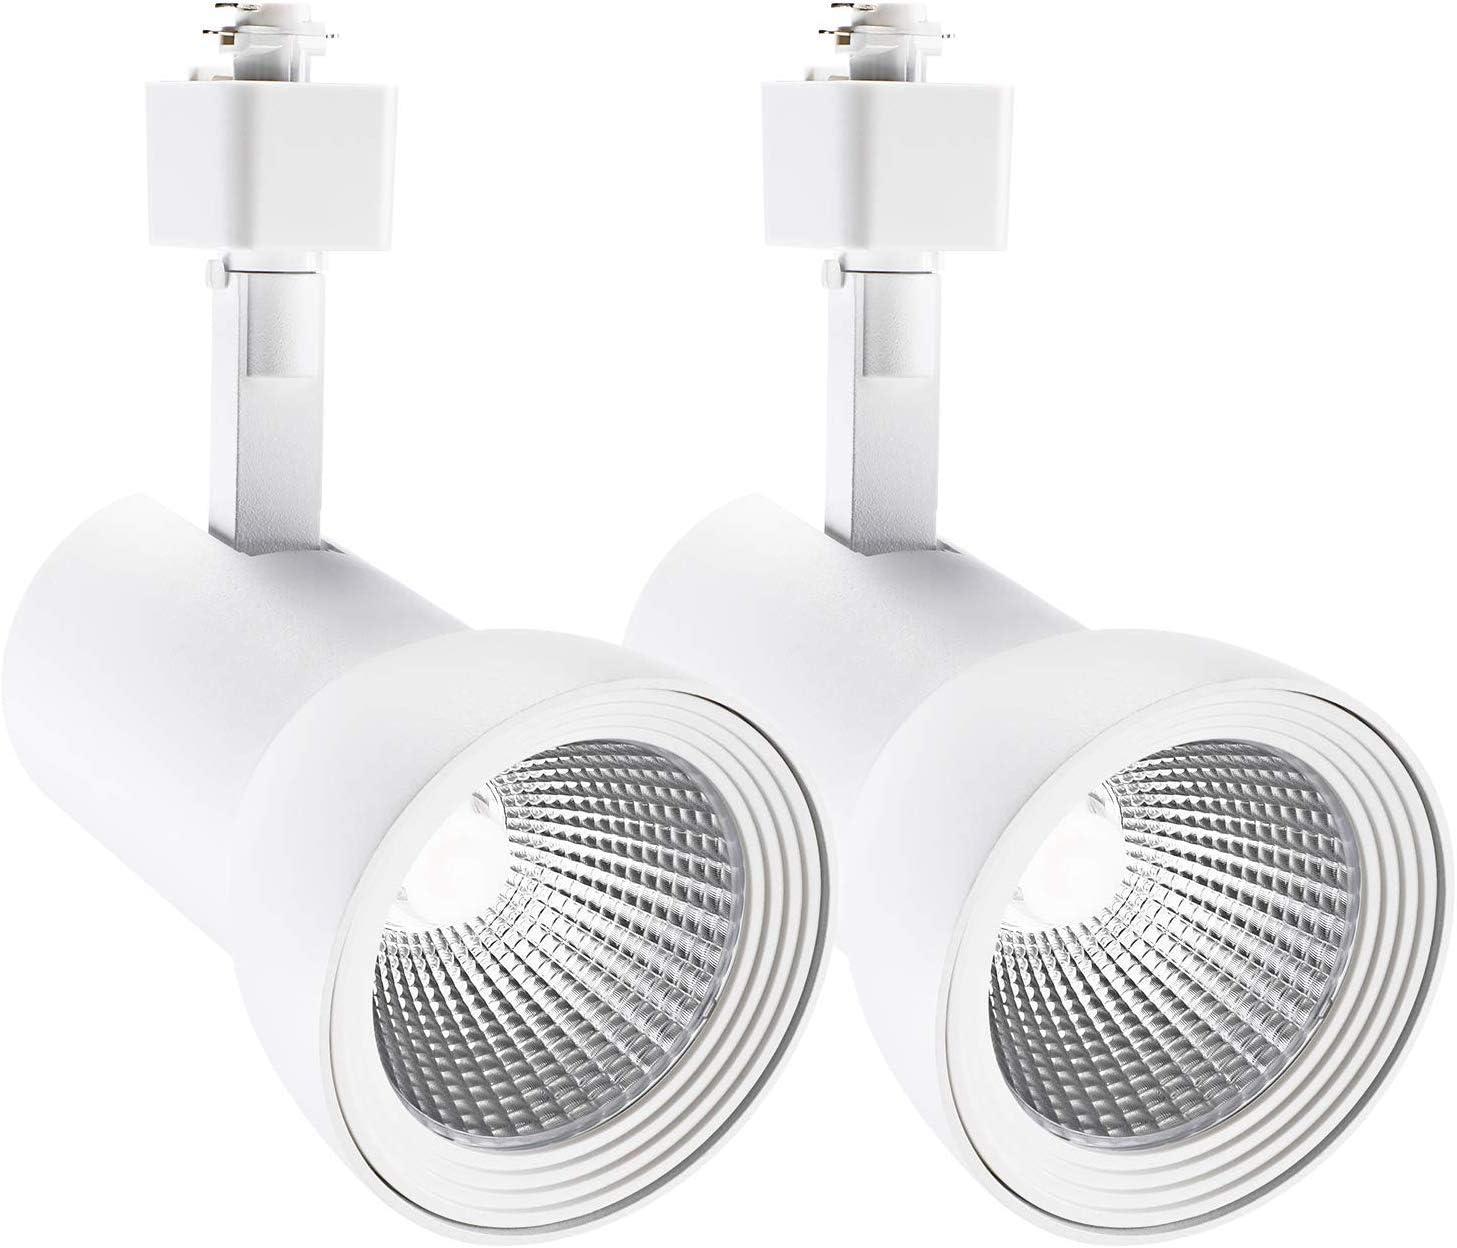 5 Years Warranty H Type Spotlight 1400lm Dimmable CRI90+ White for Wall Exhibition Lighting Energy Star /& ETL Listed LEONLITE 18W Aluminum LED Track Lighting Heads Pack of 4 3000K Warm White